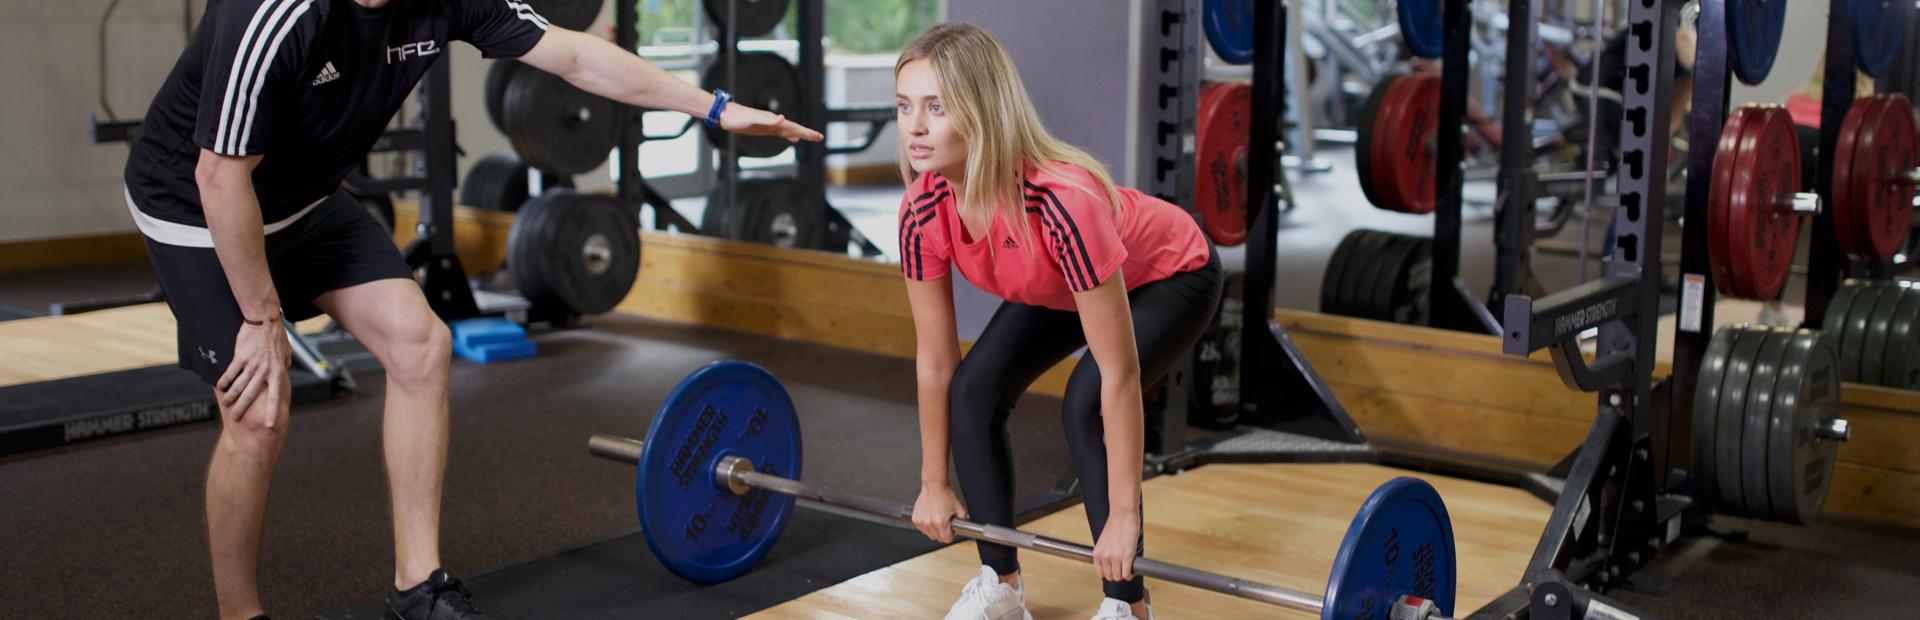 Personal training tutor coaching a deadlift